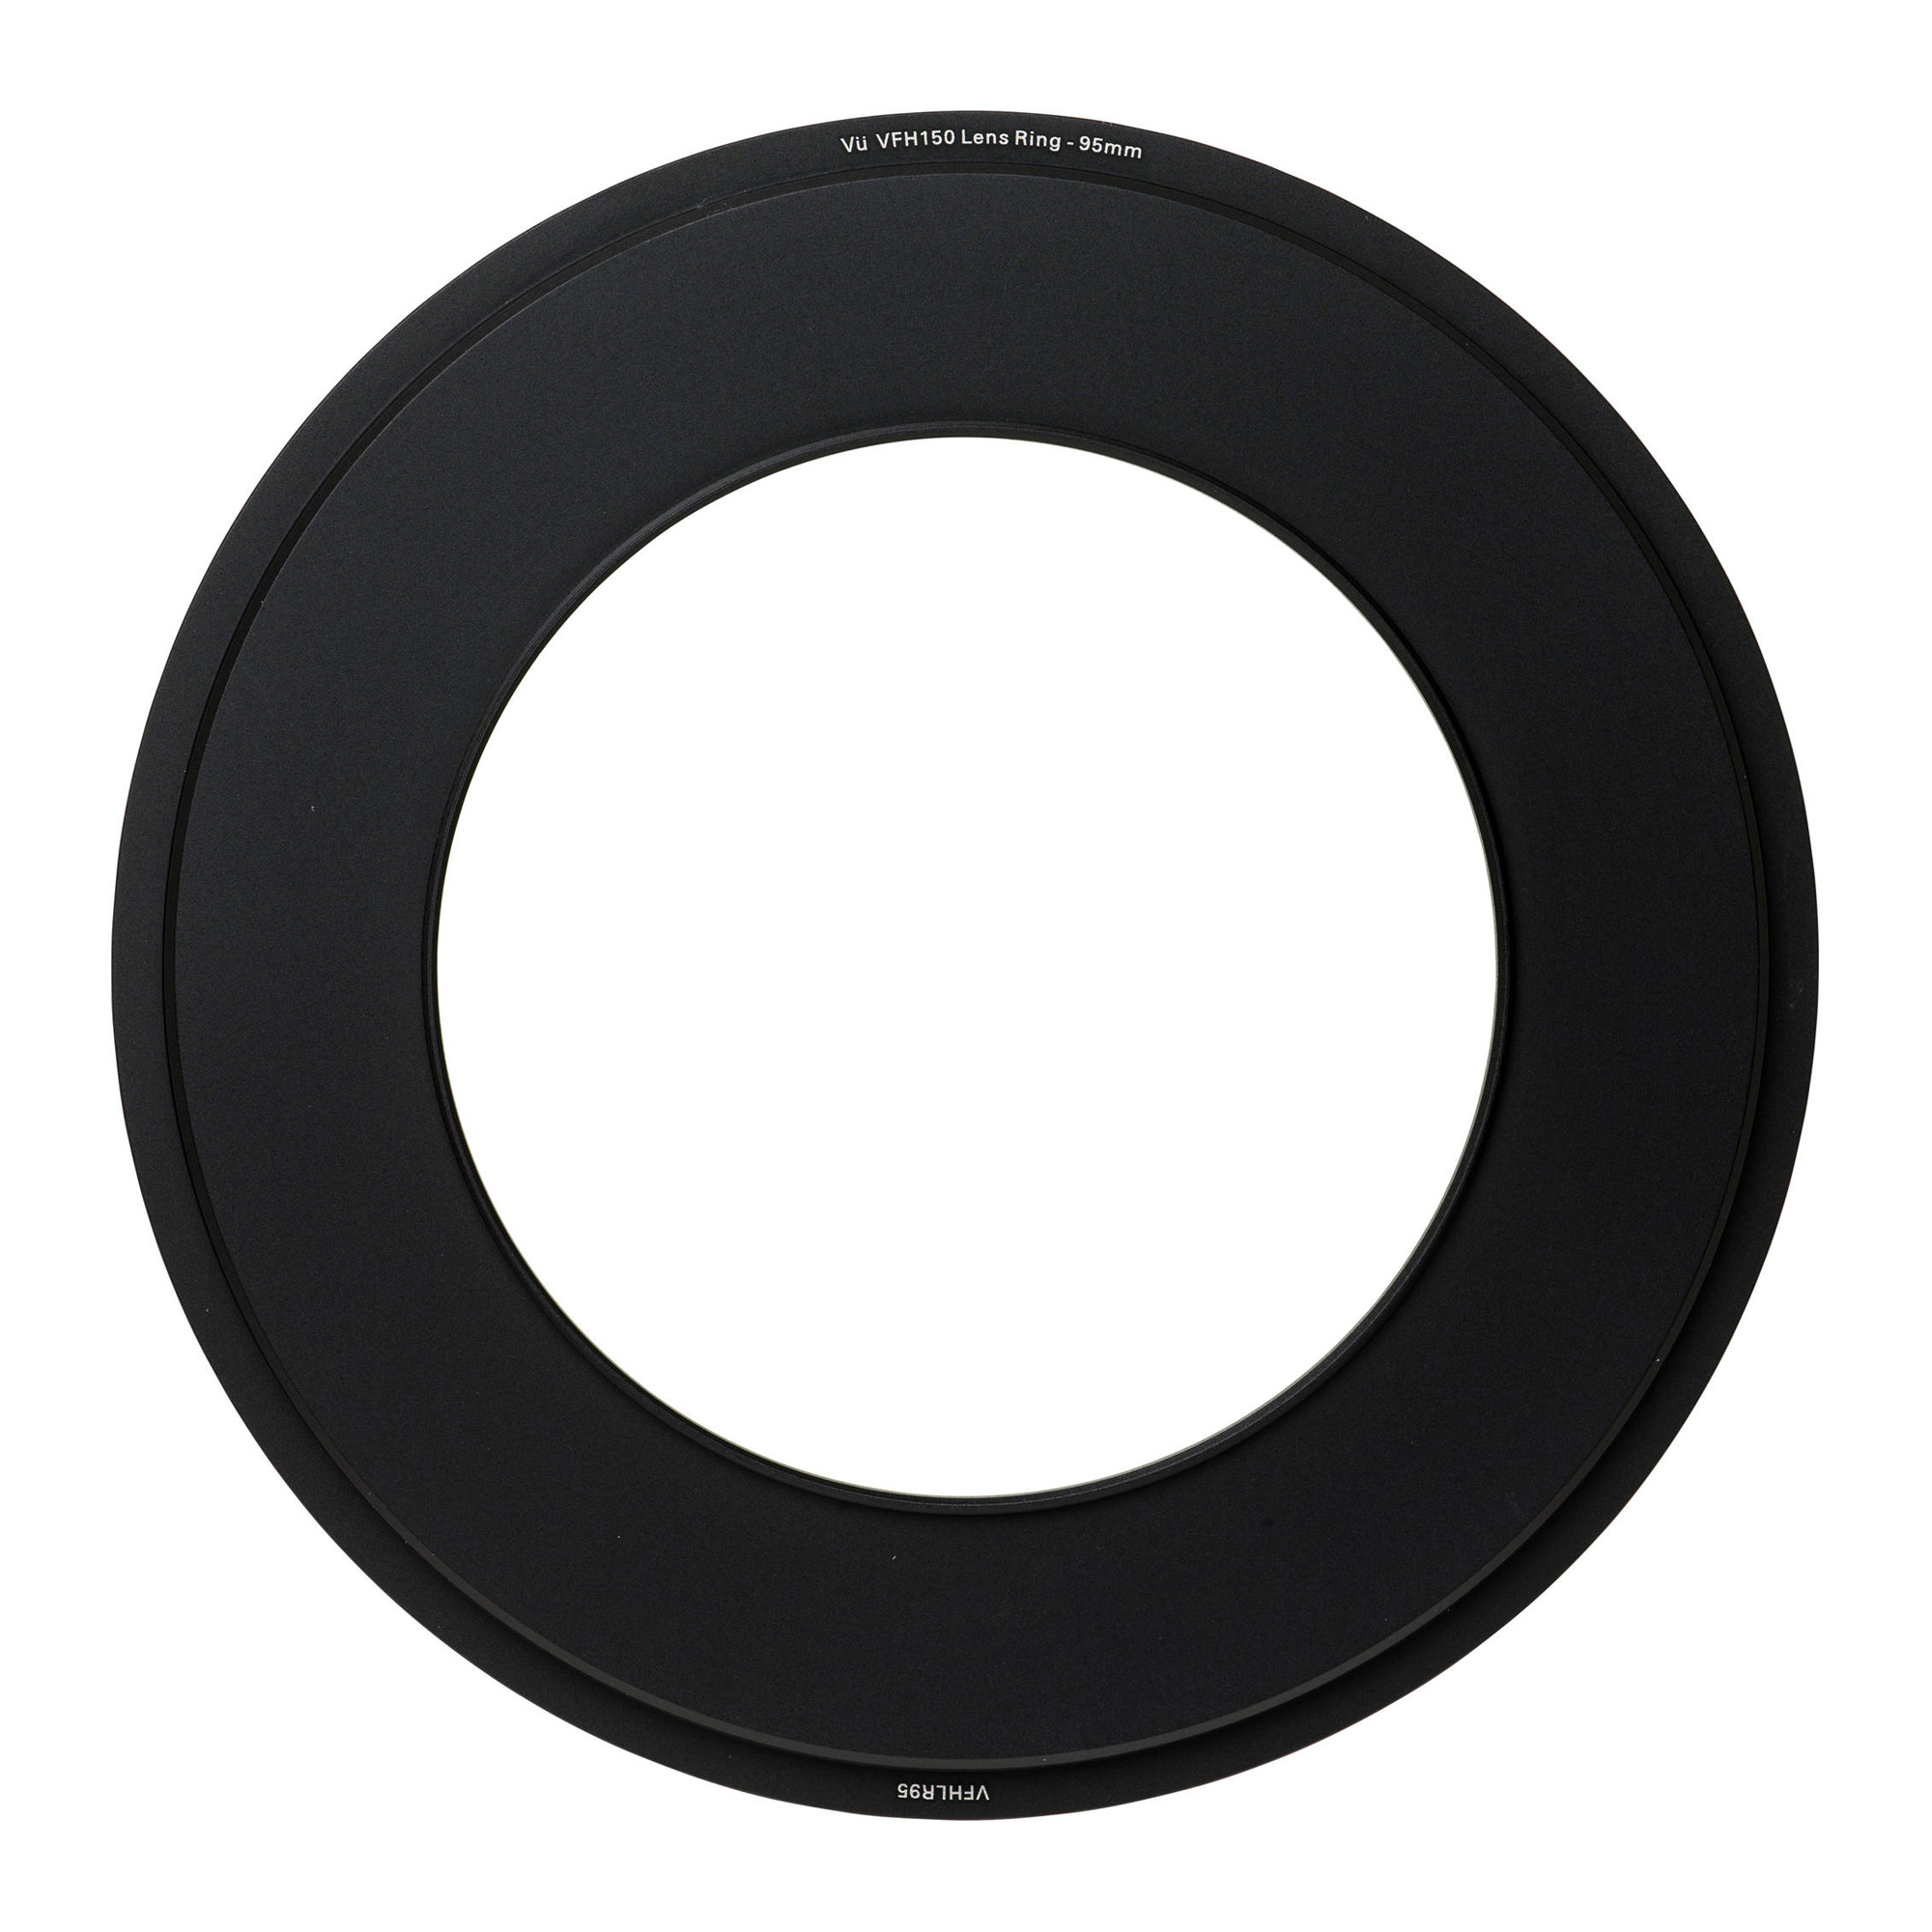 150mm Professional Filter Holder 95mm Lens Ring